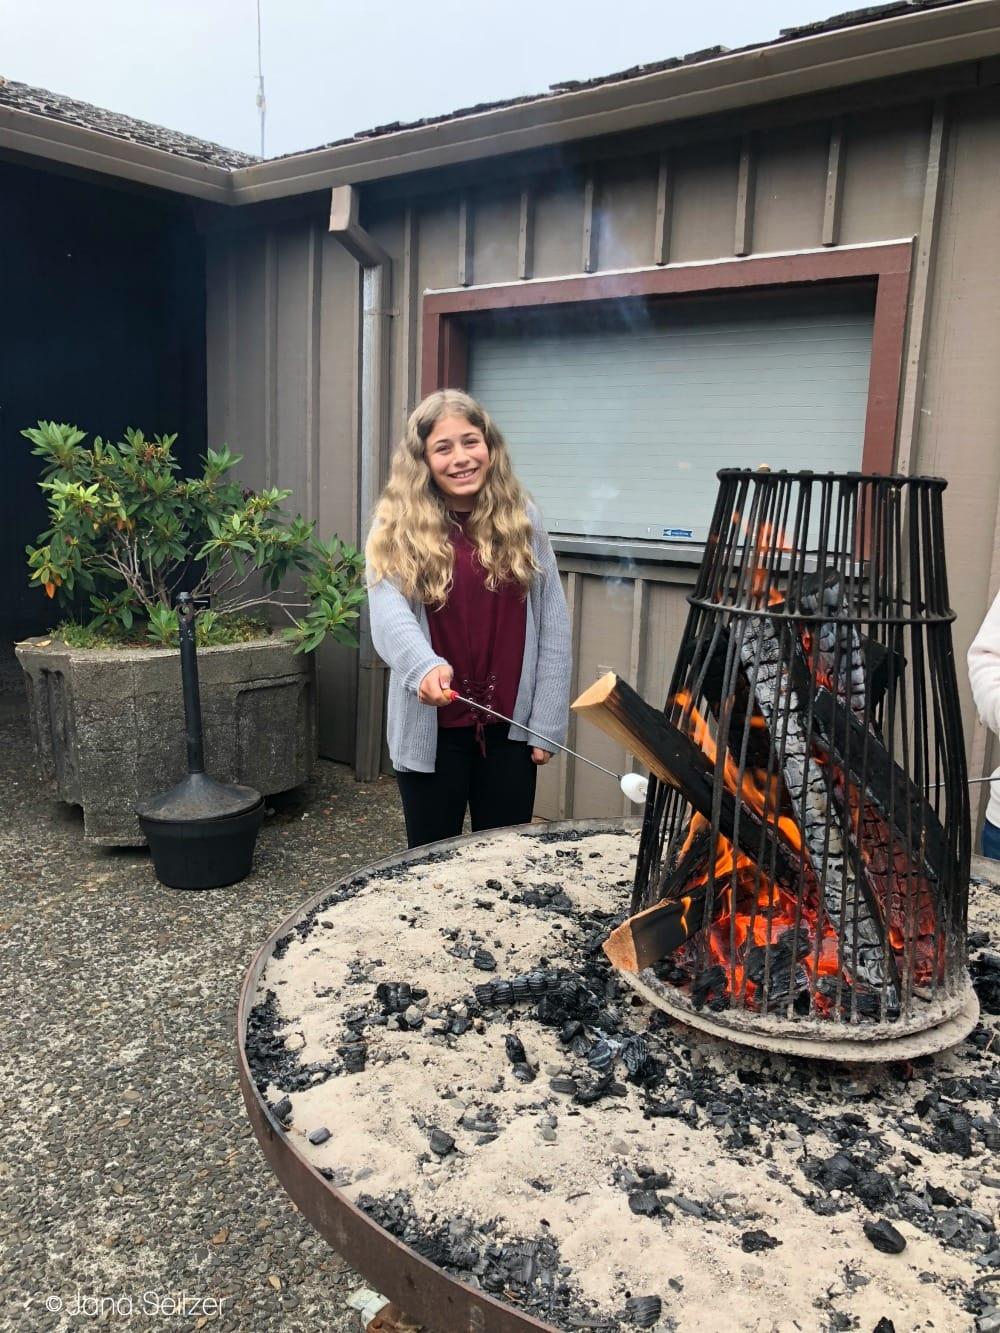 Summer at Salishan Resort on the Oregon Coast - make your own smores